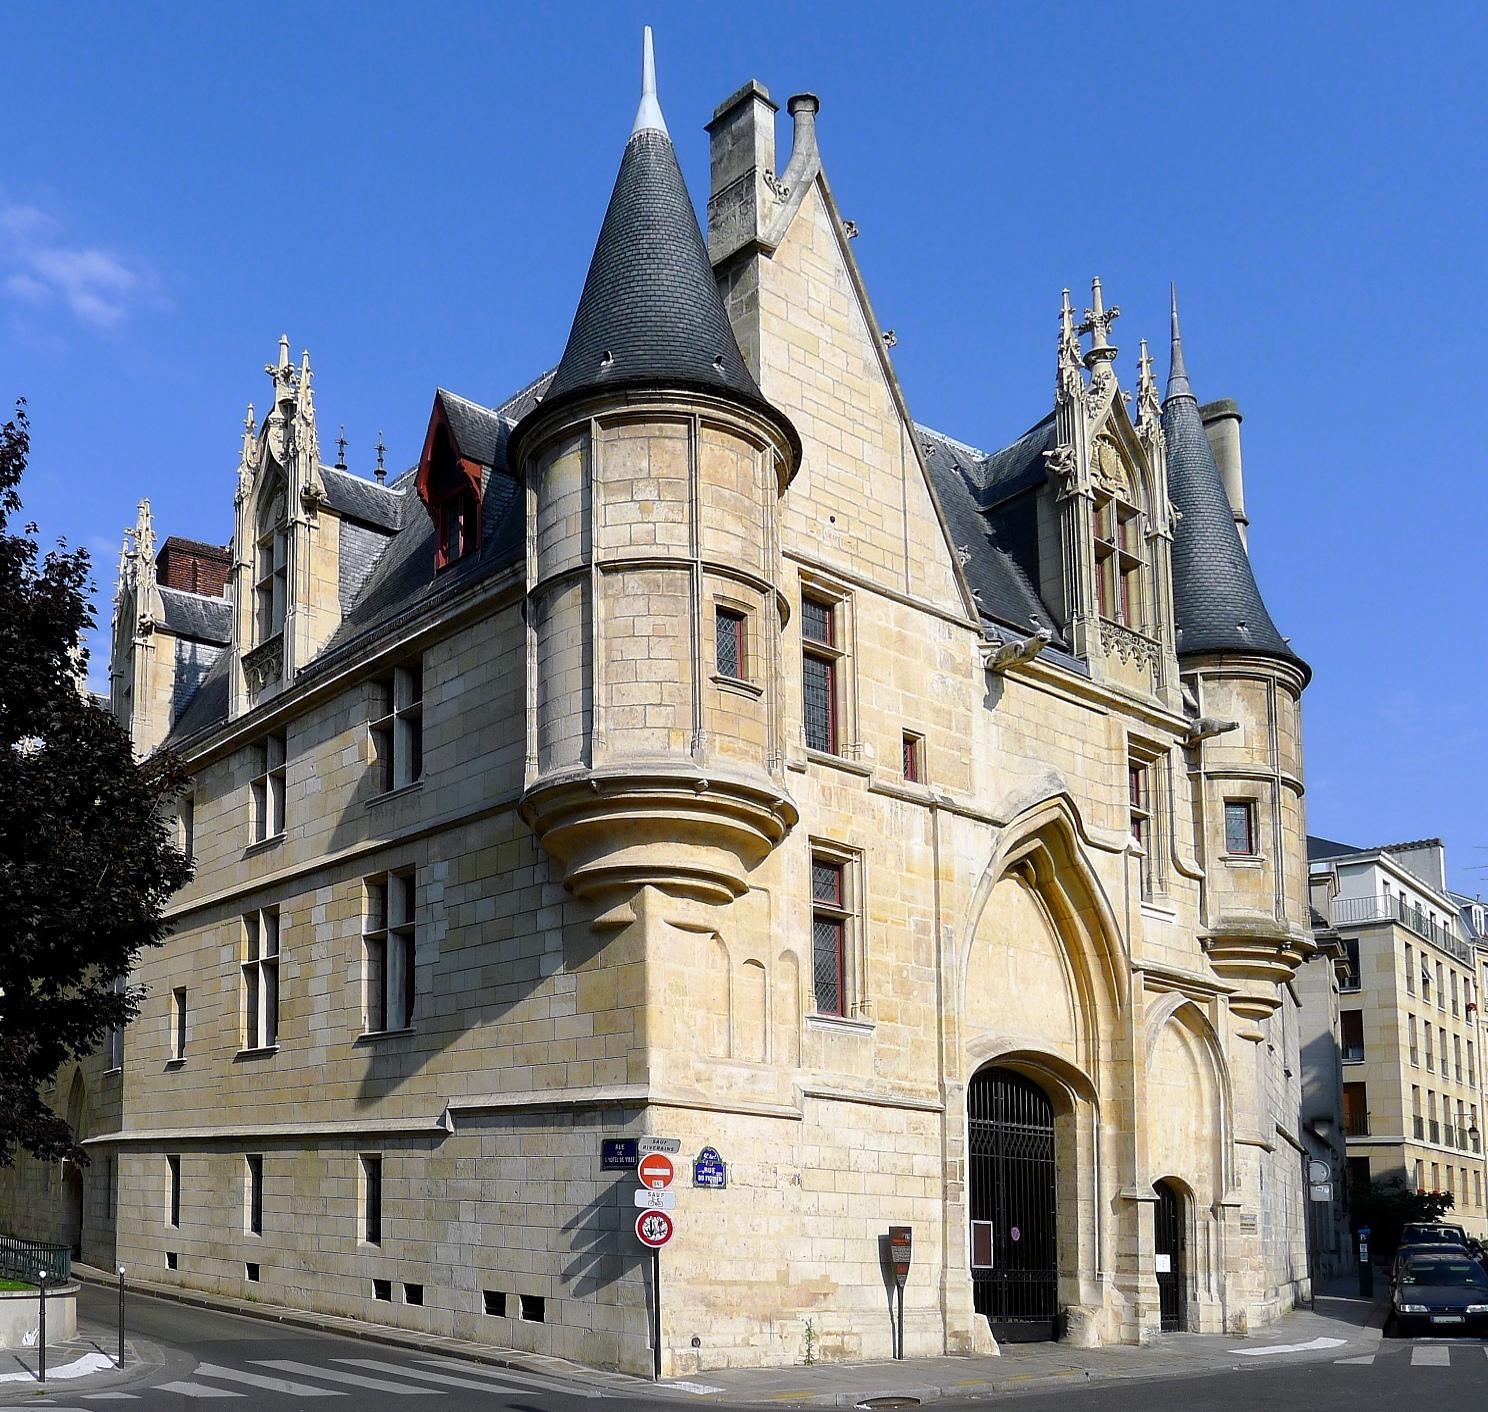 Hotel De Paris Chatel Guyon Menus